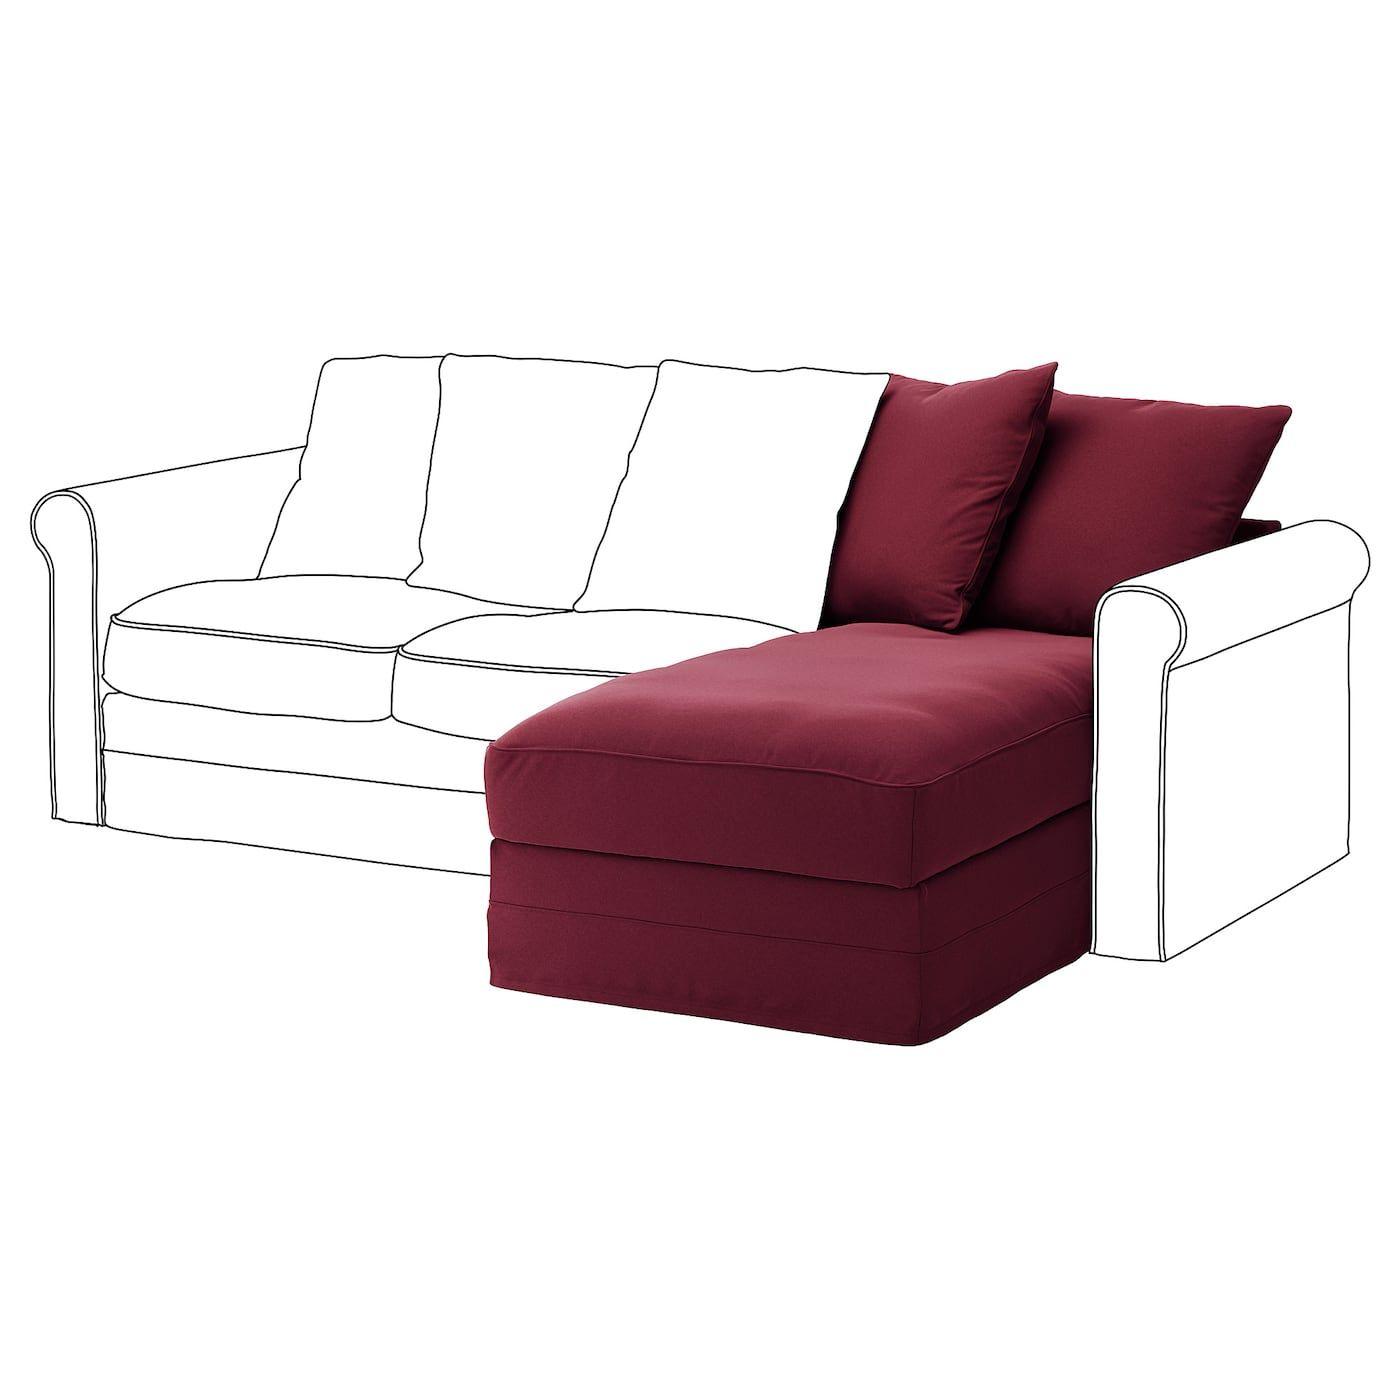 Pin Von Brenda Nichols Auf House Plans In 2020 Chaiselongue Modulares Sofa Dunkelrot